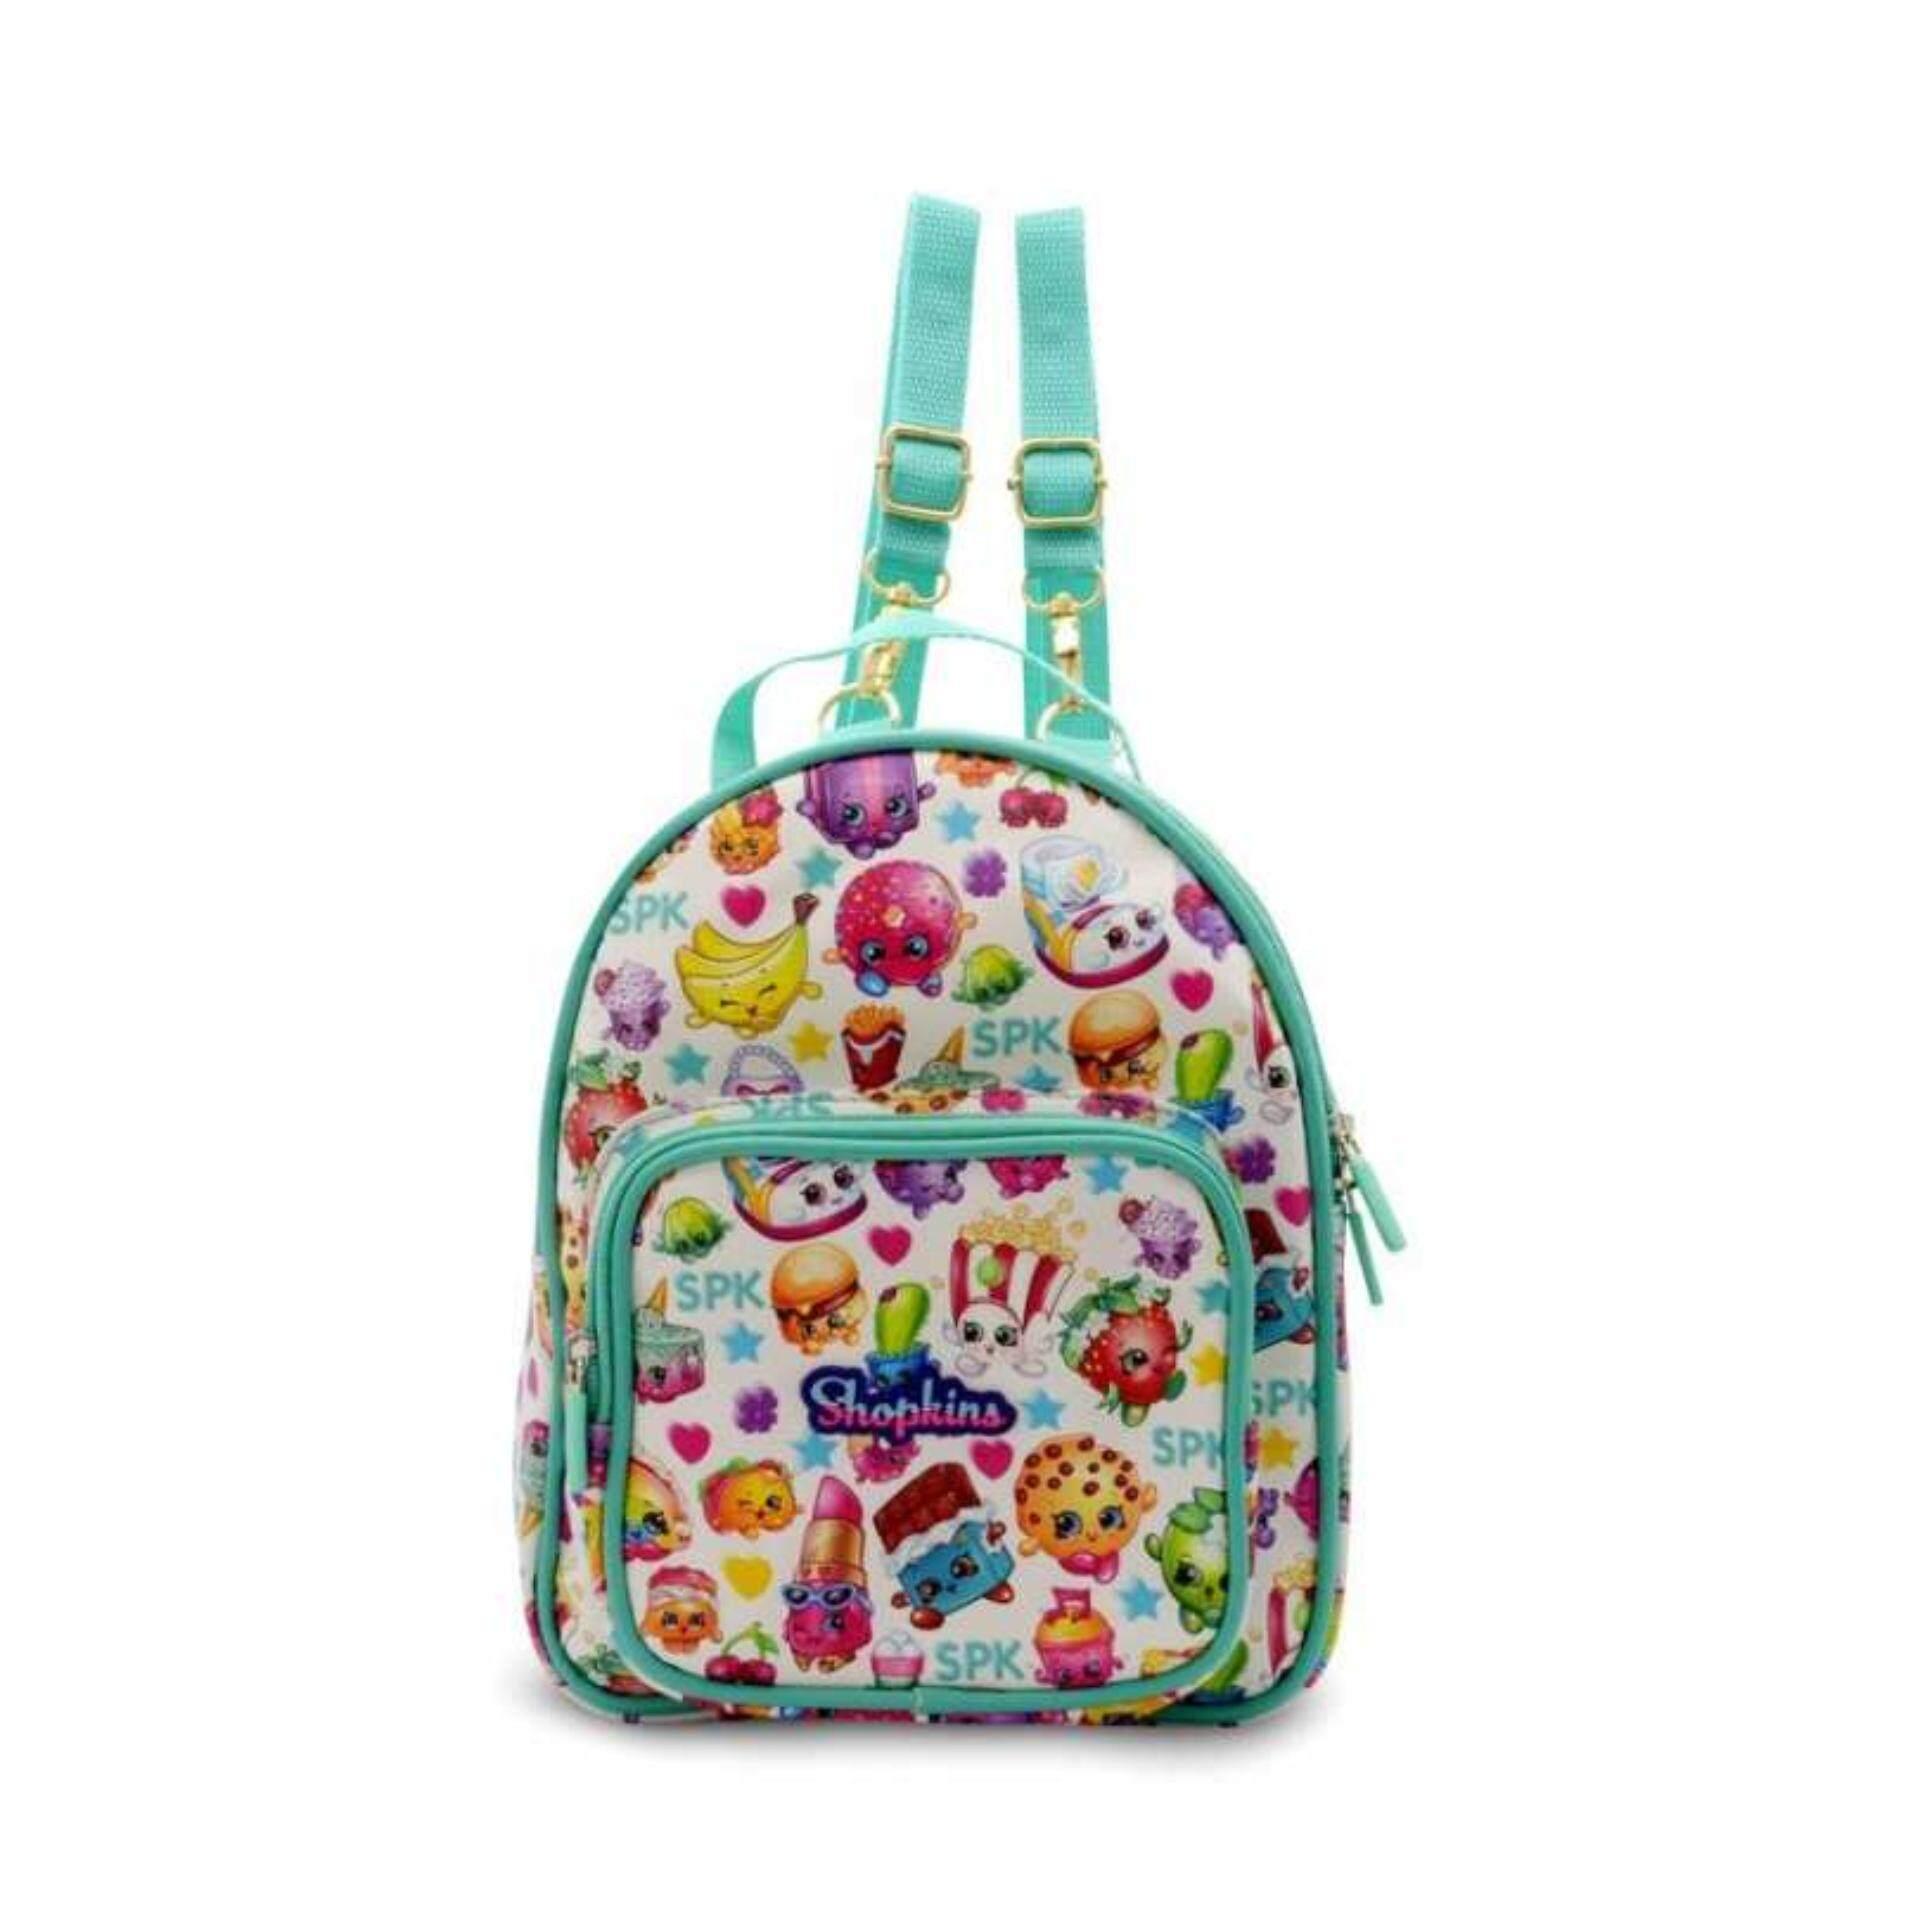 Shopkins Backpack School Bag 10 Inches - Light Blue Colour